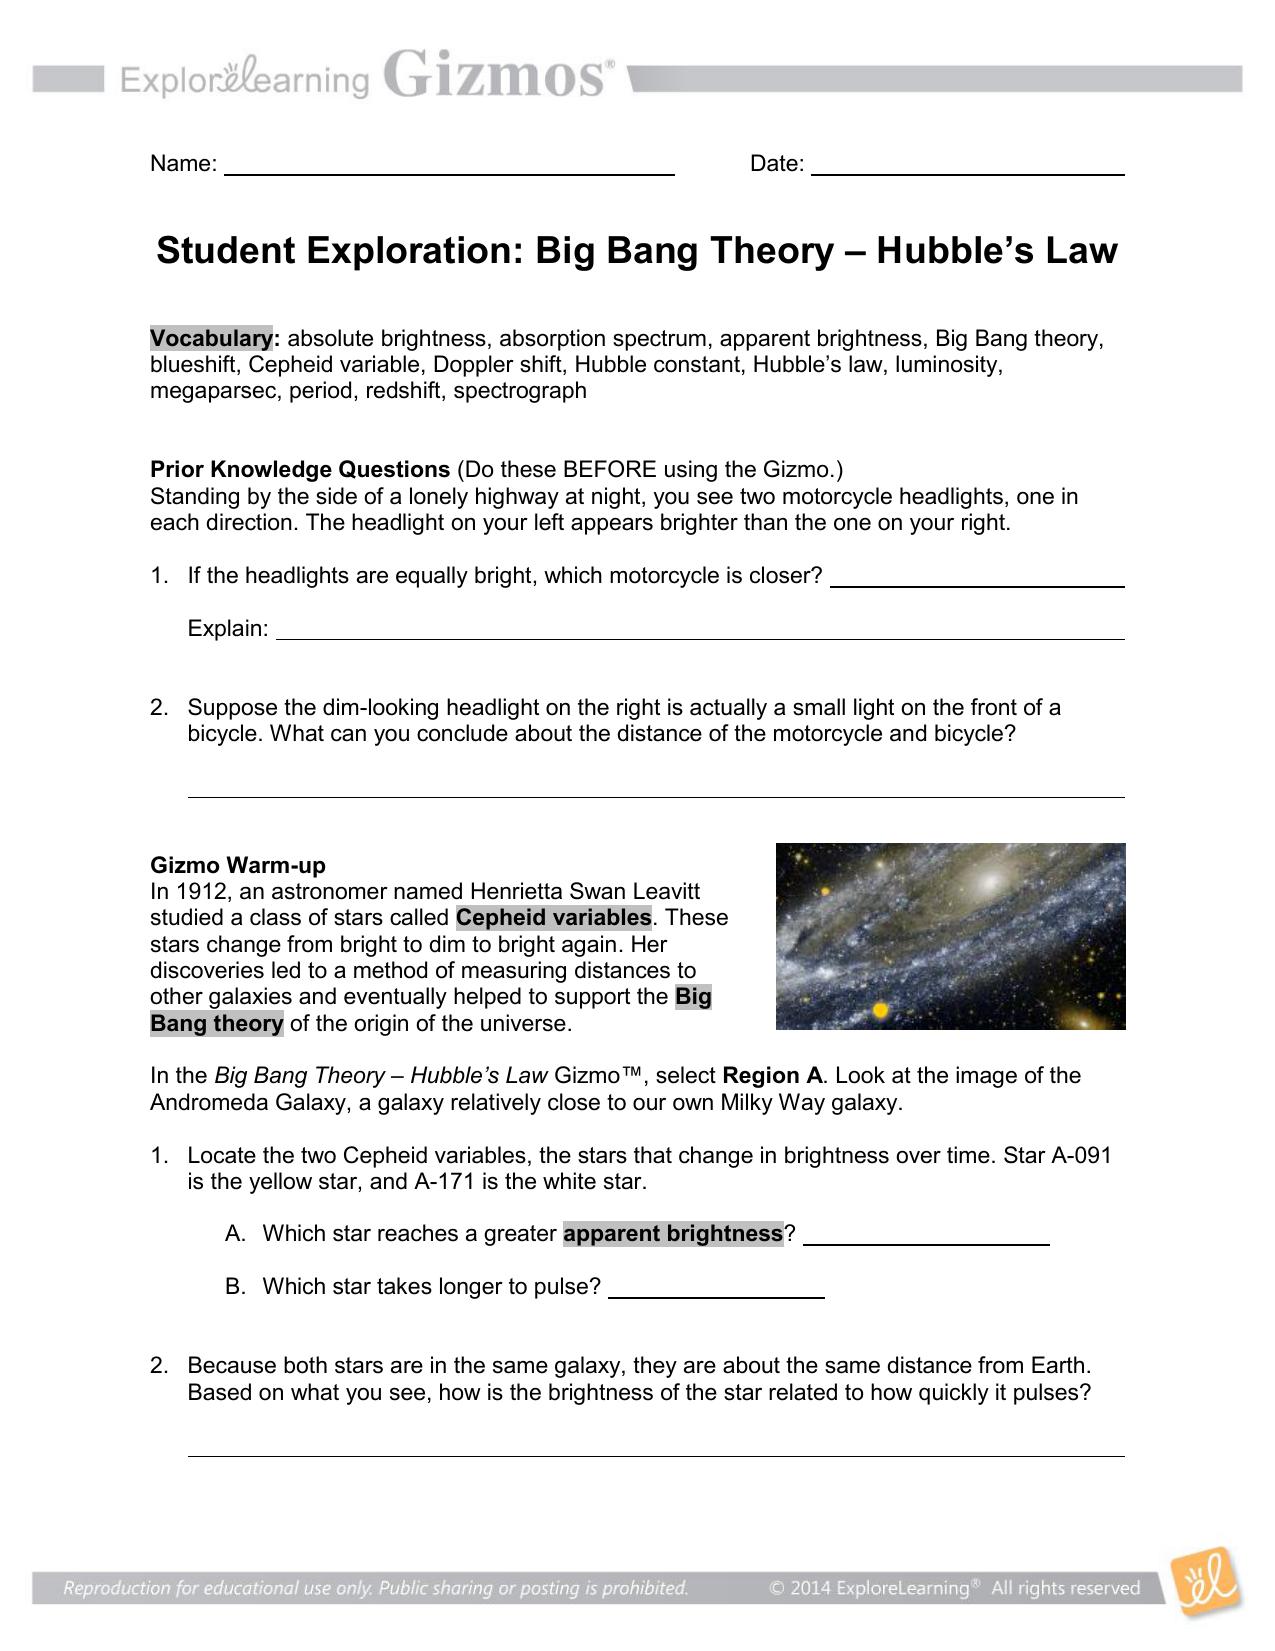 Student Exploration Ionic Bonds Gizmo Answer Key Activity ...